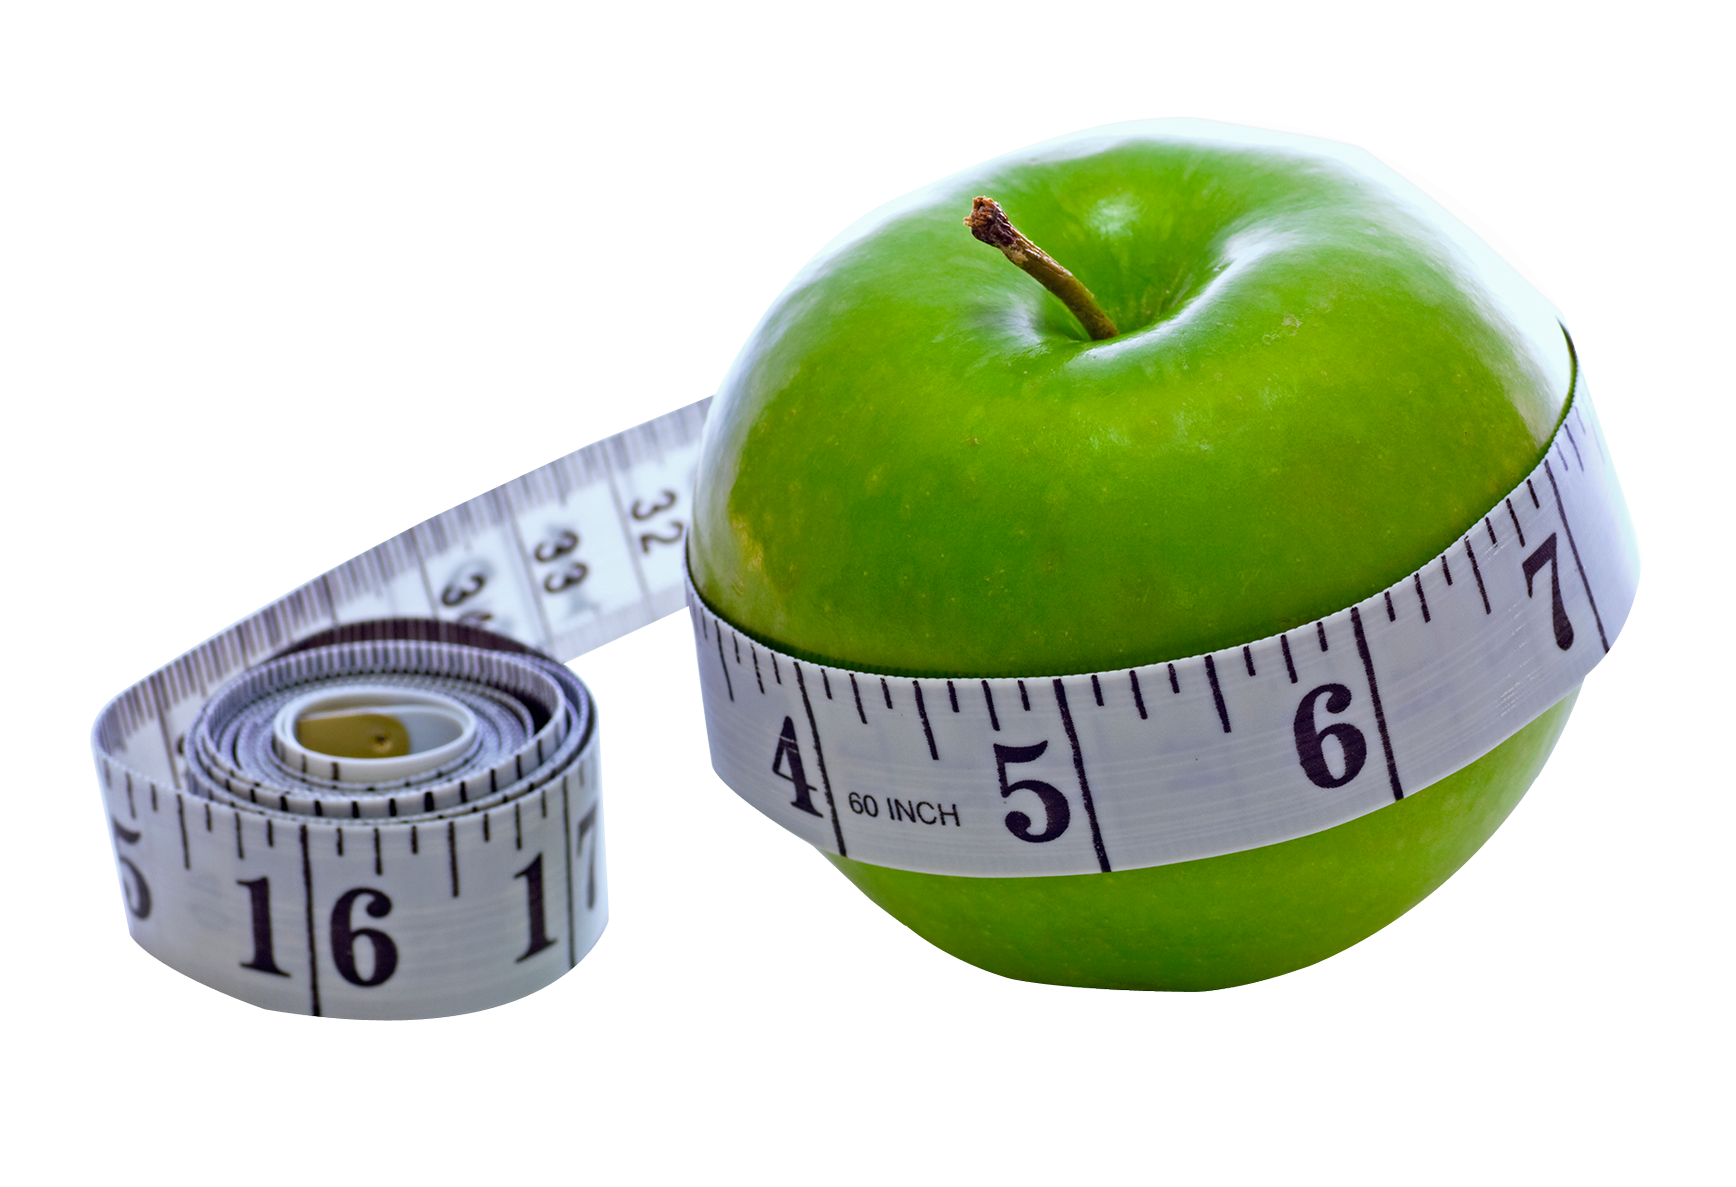 Diet Apple PNG Image